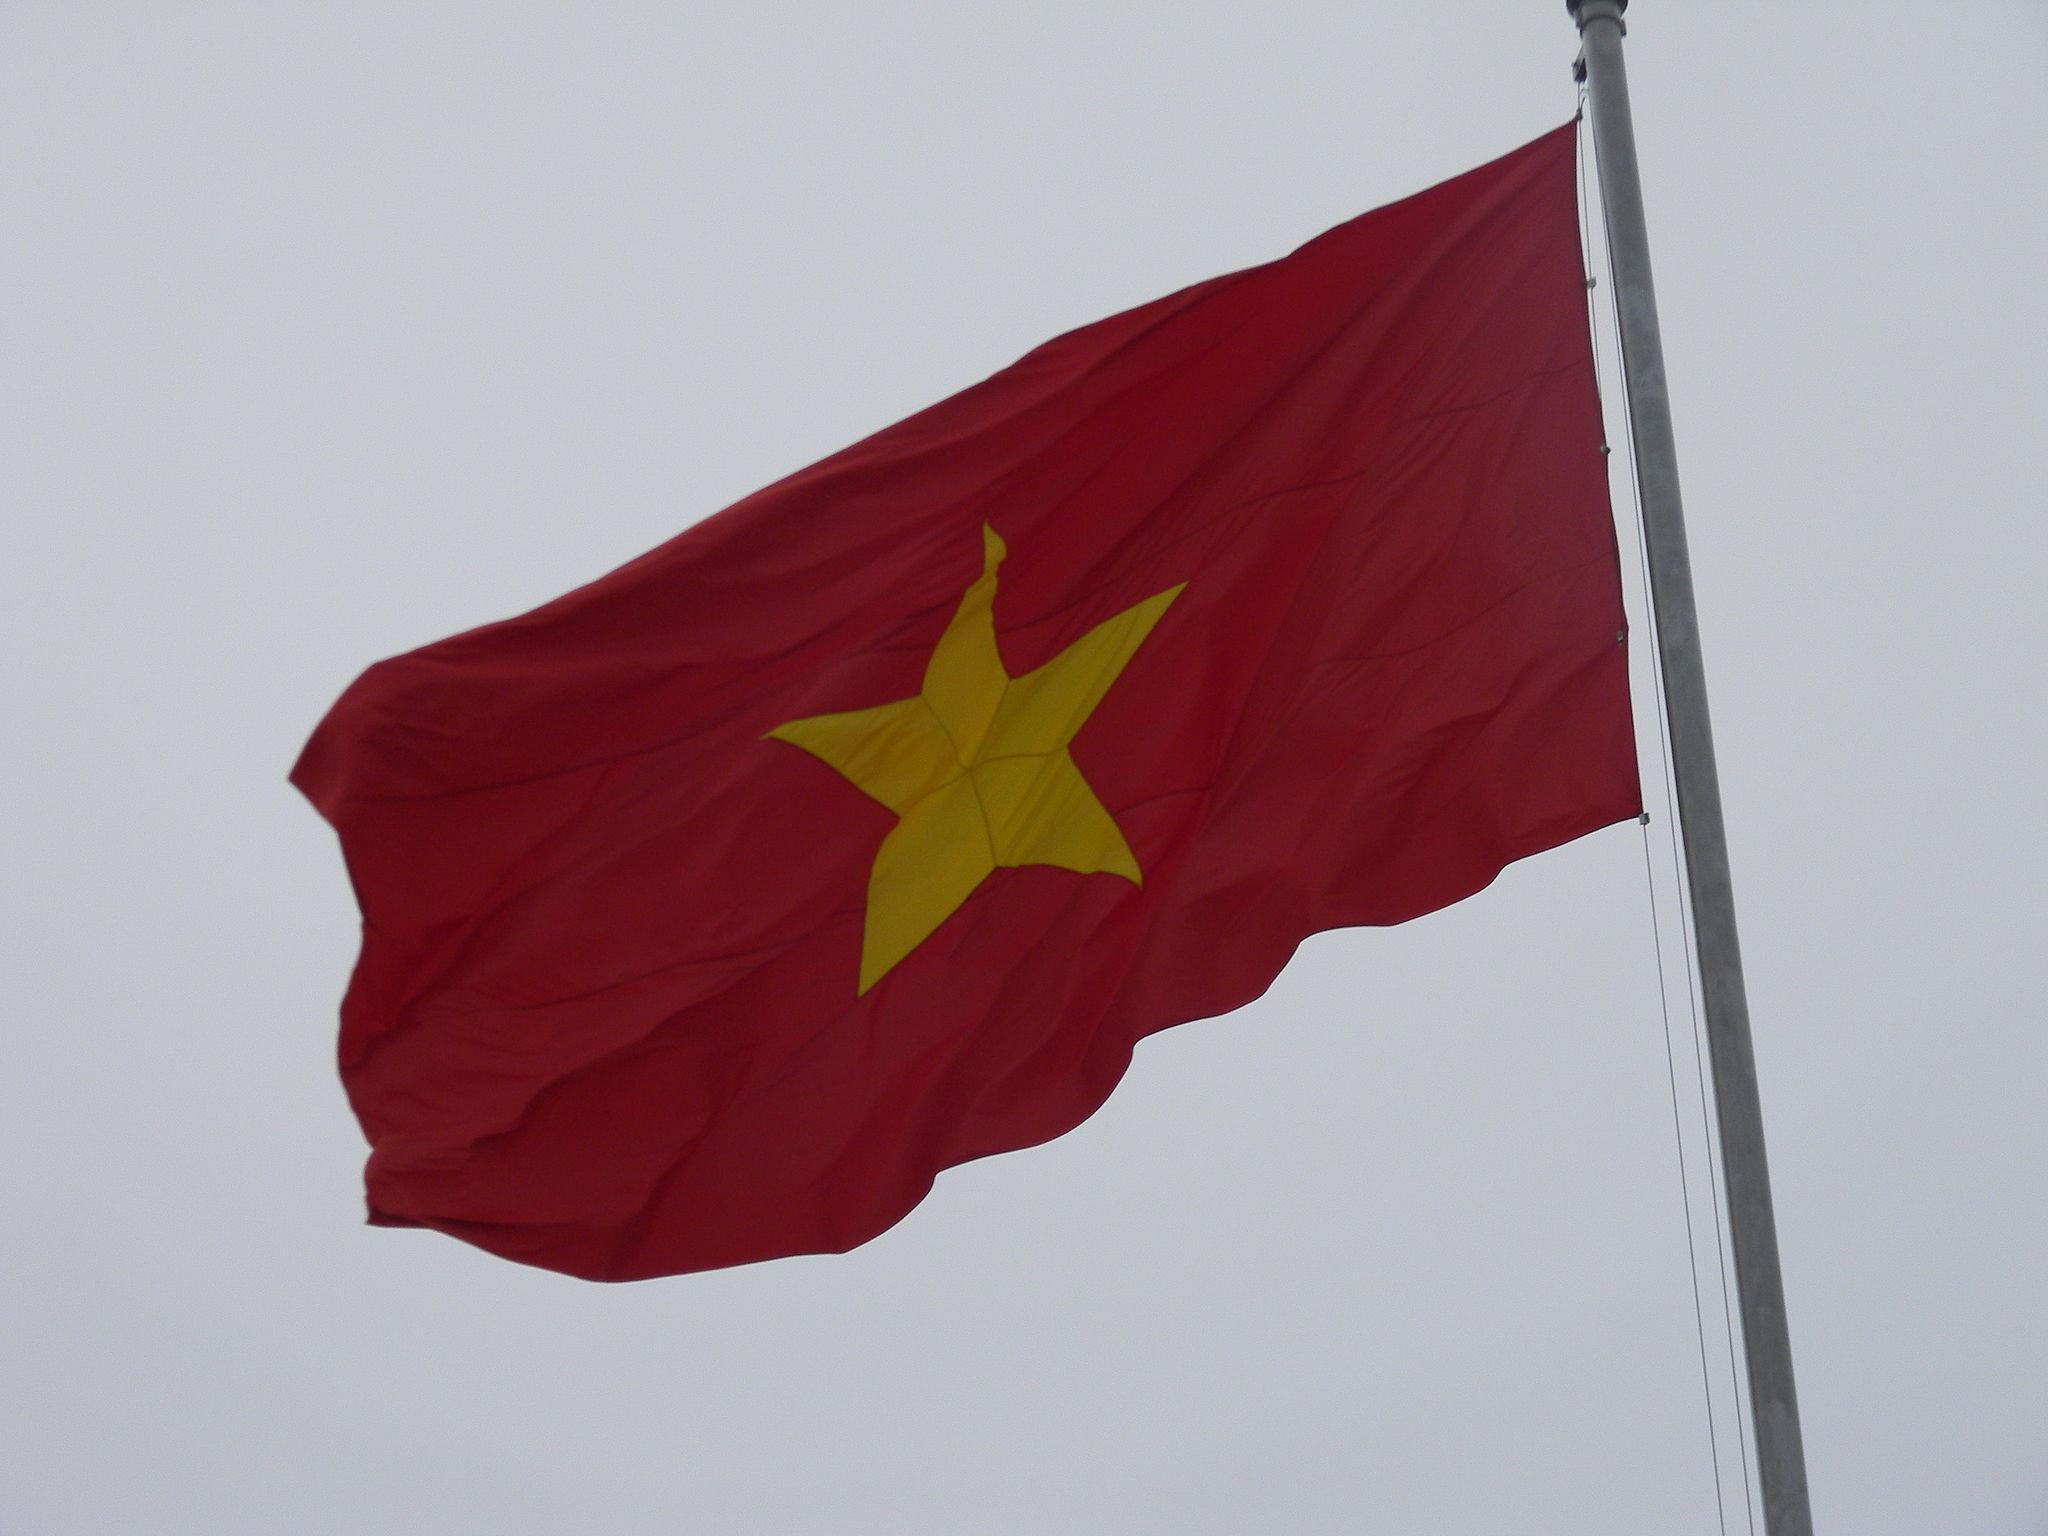 Why has no one in Vietnam died from Coronavirus?